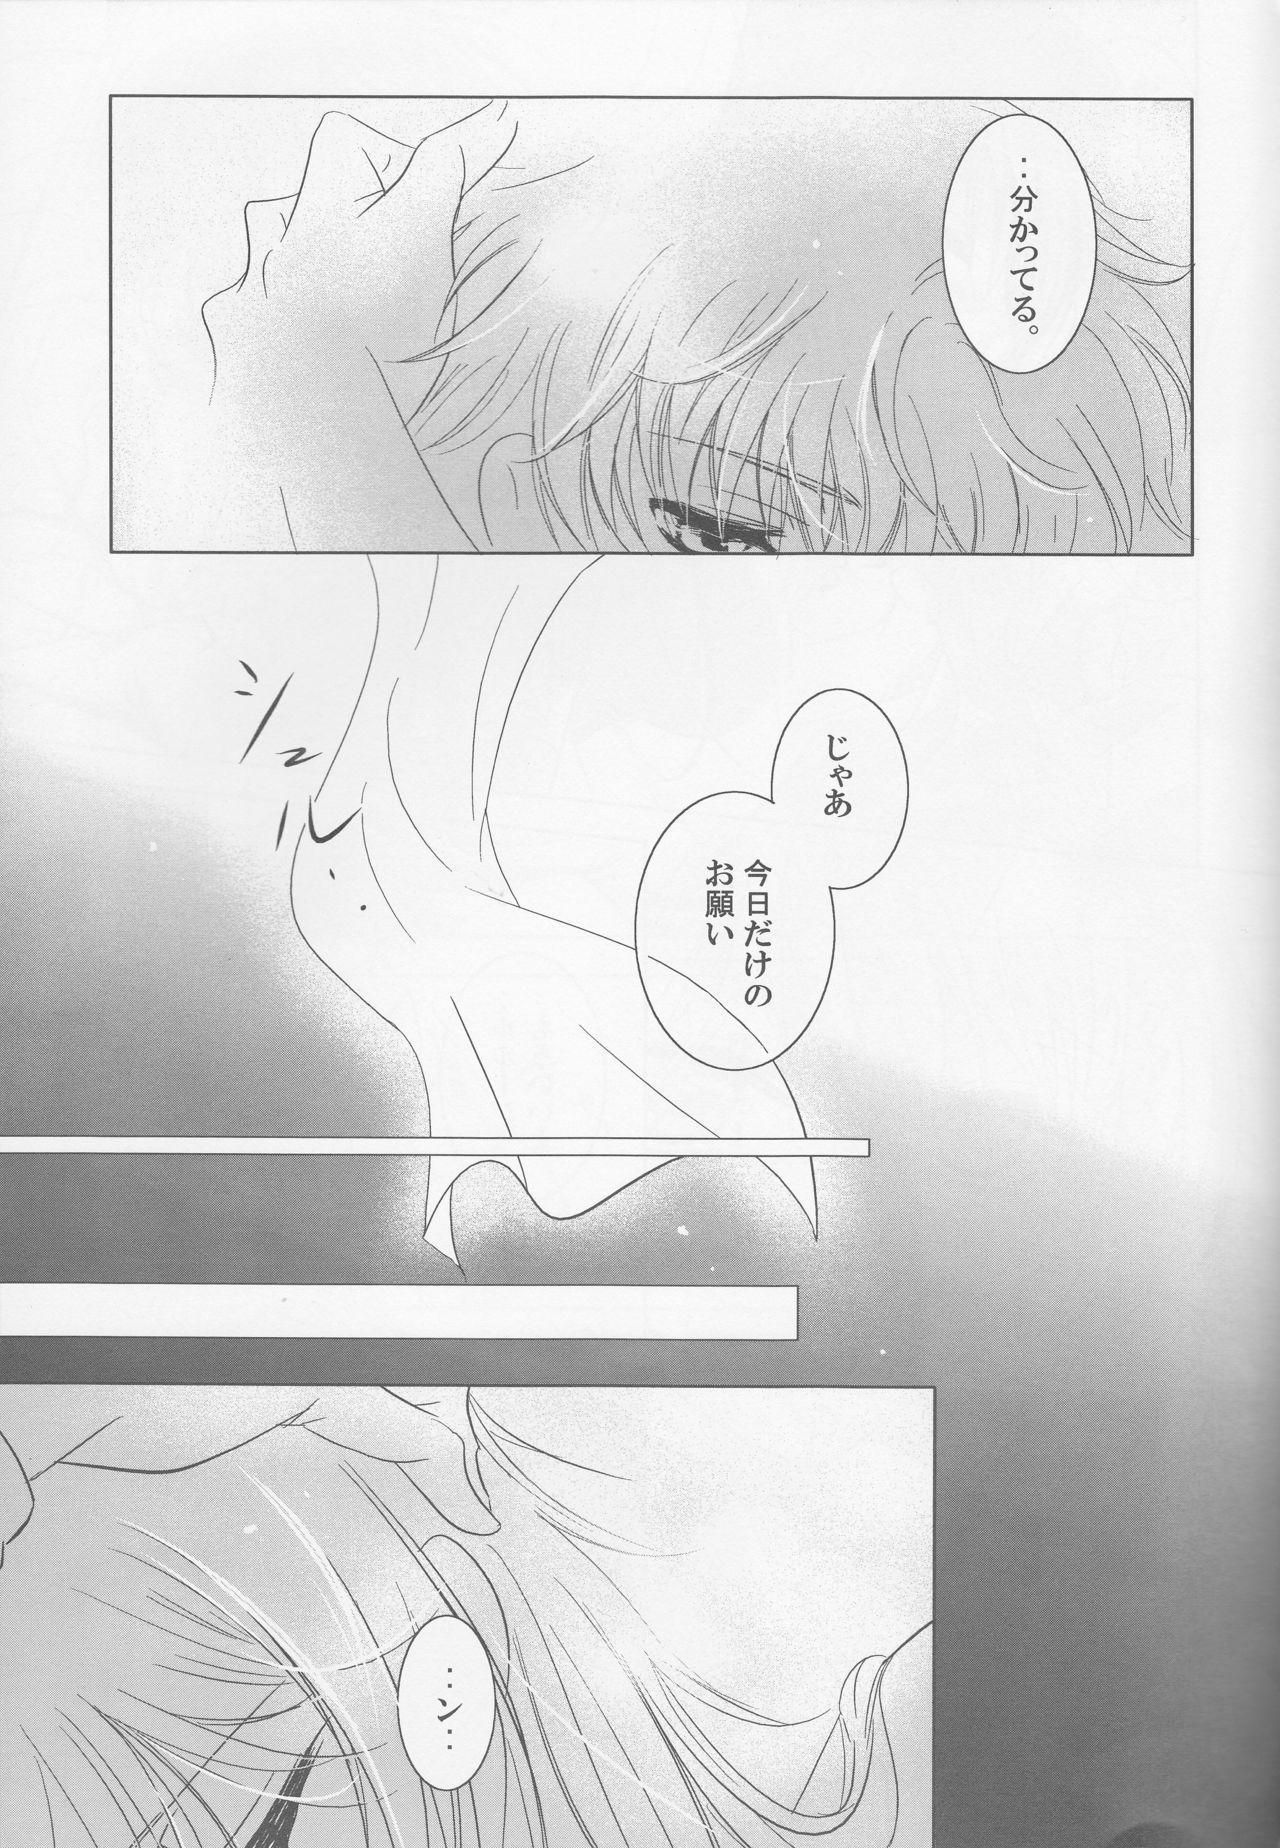 Mitaiken Ryouiki 10